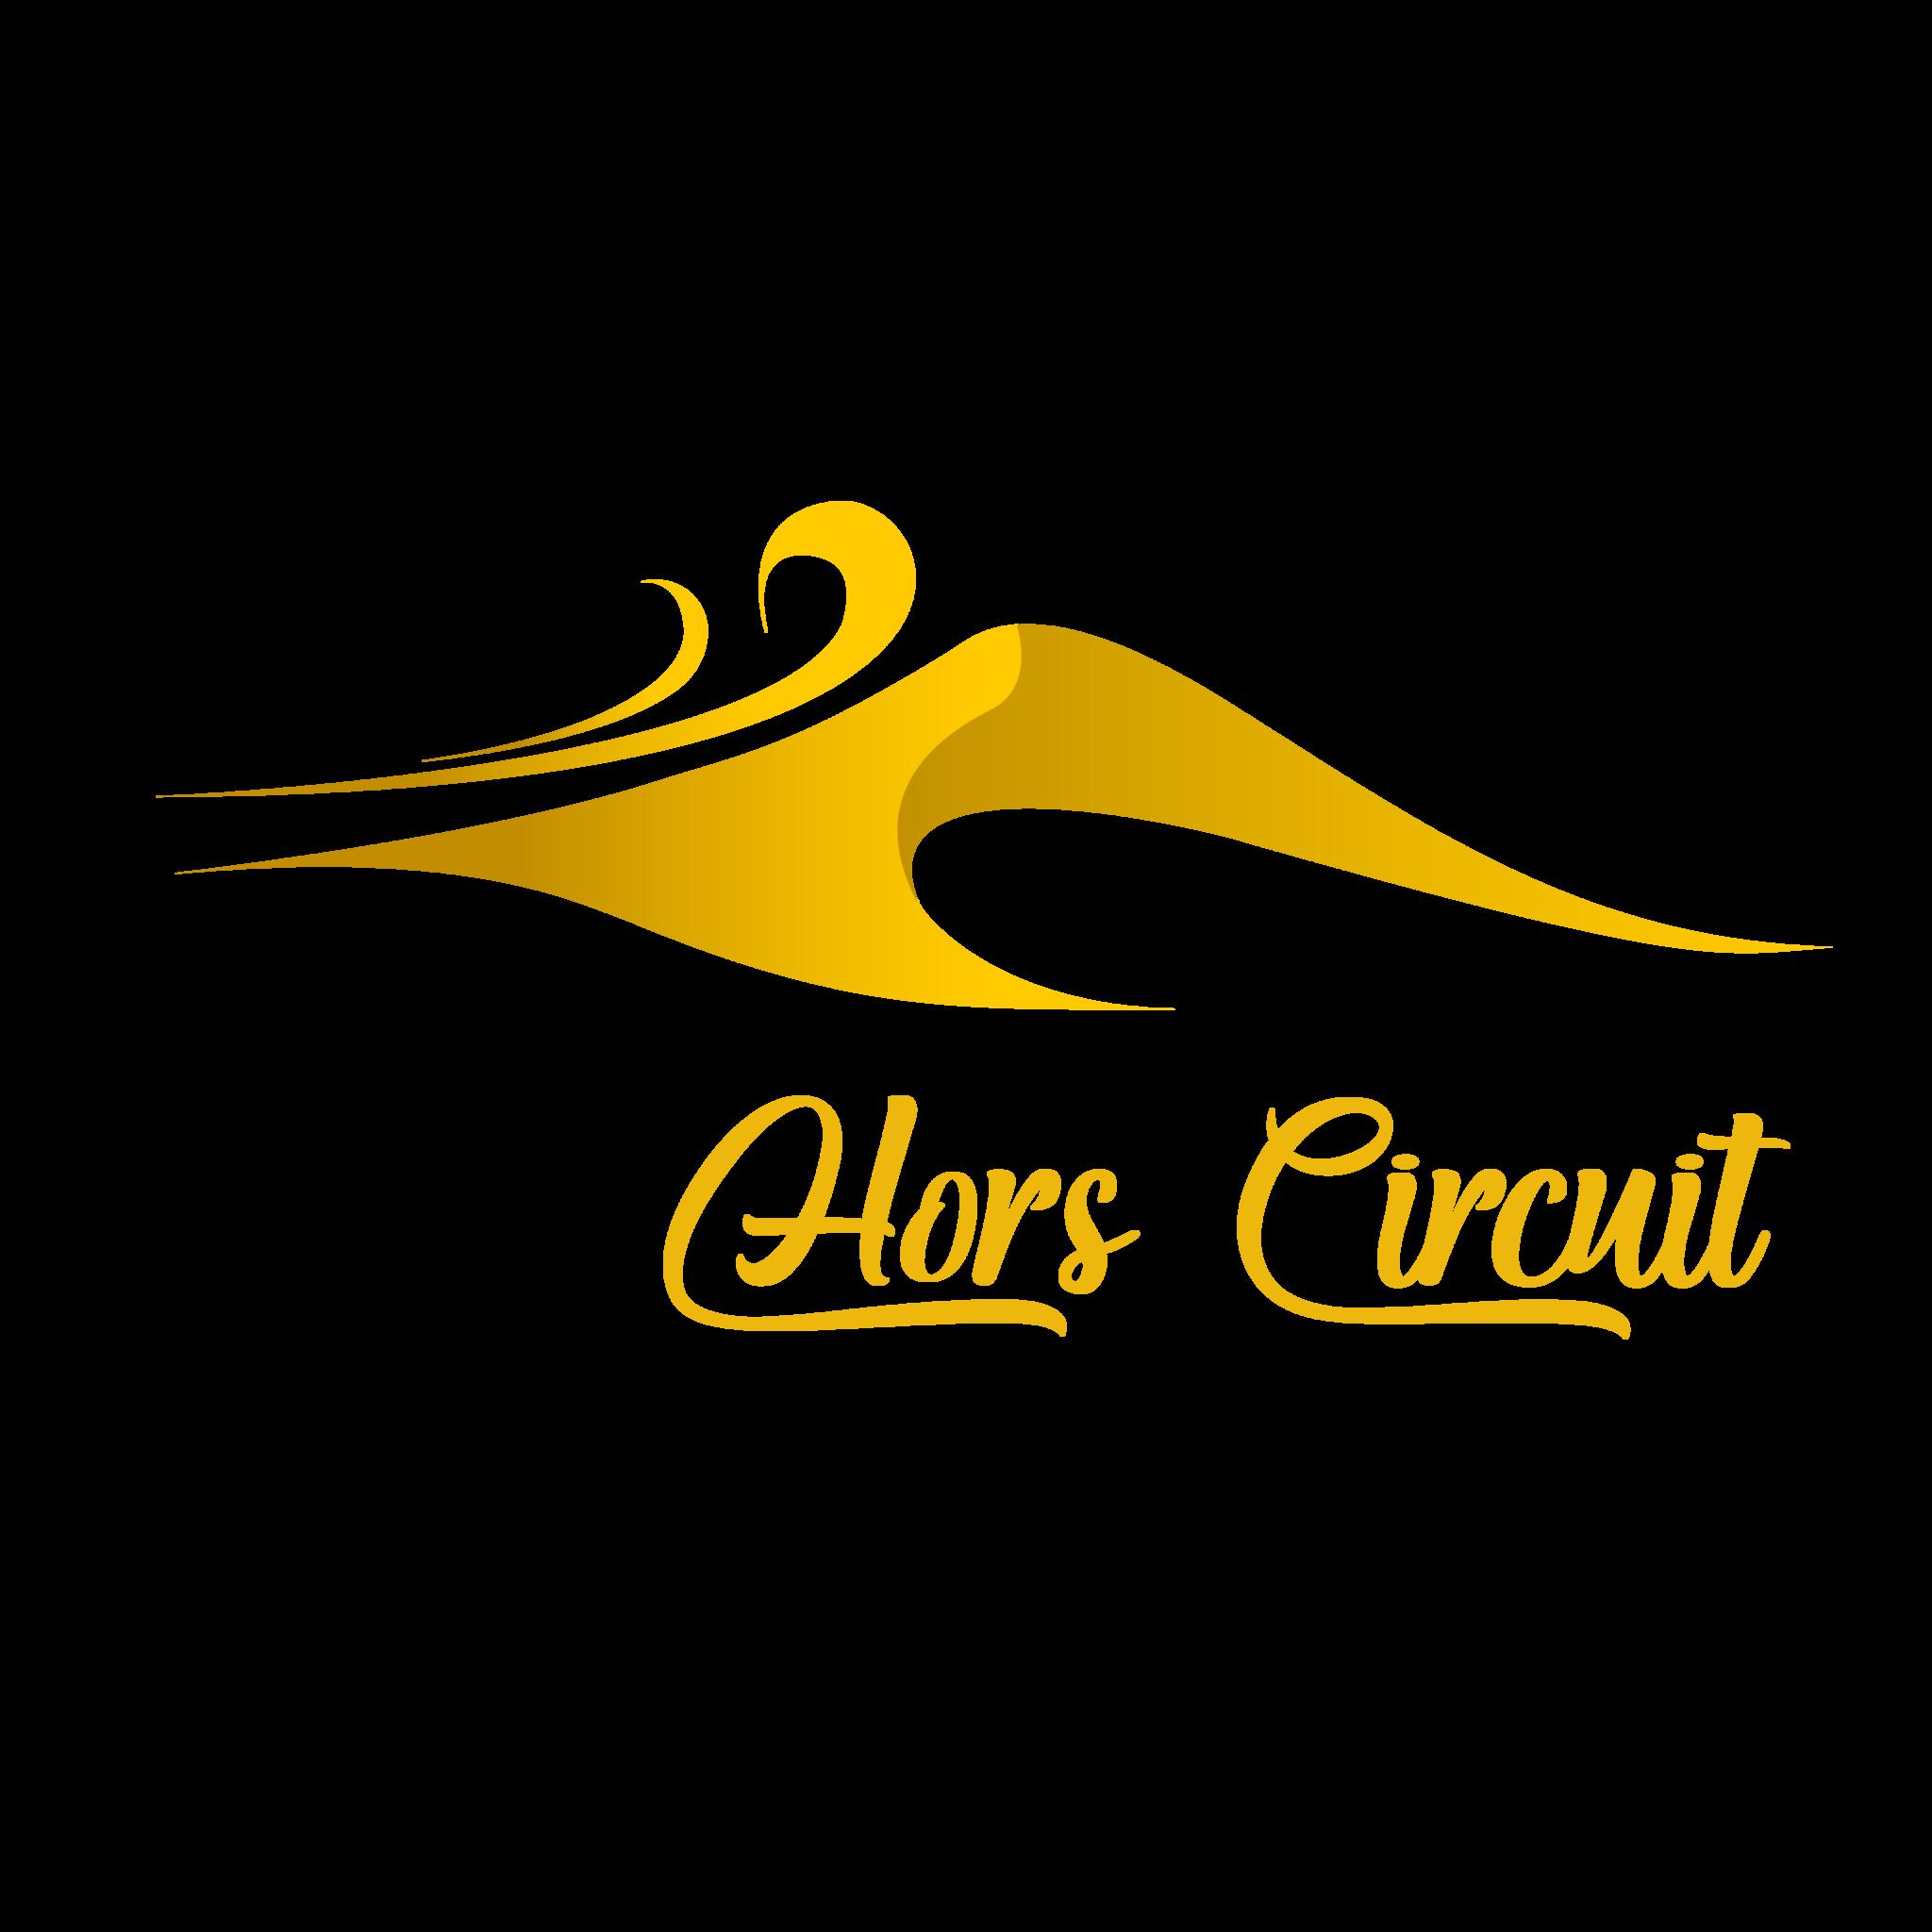 ©hors-circuit-logo1